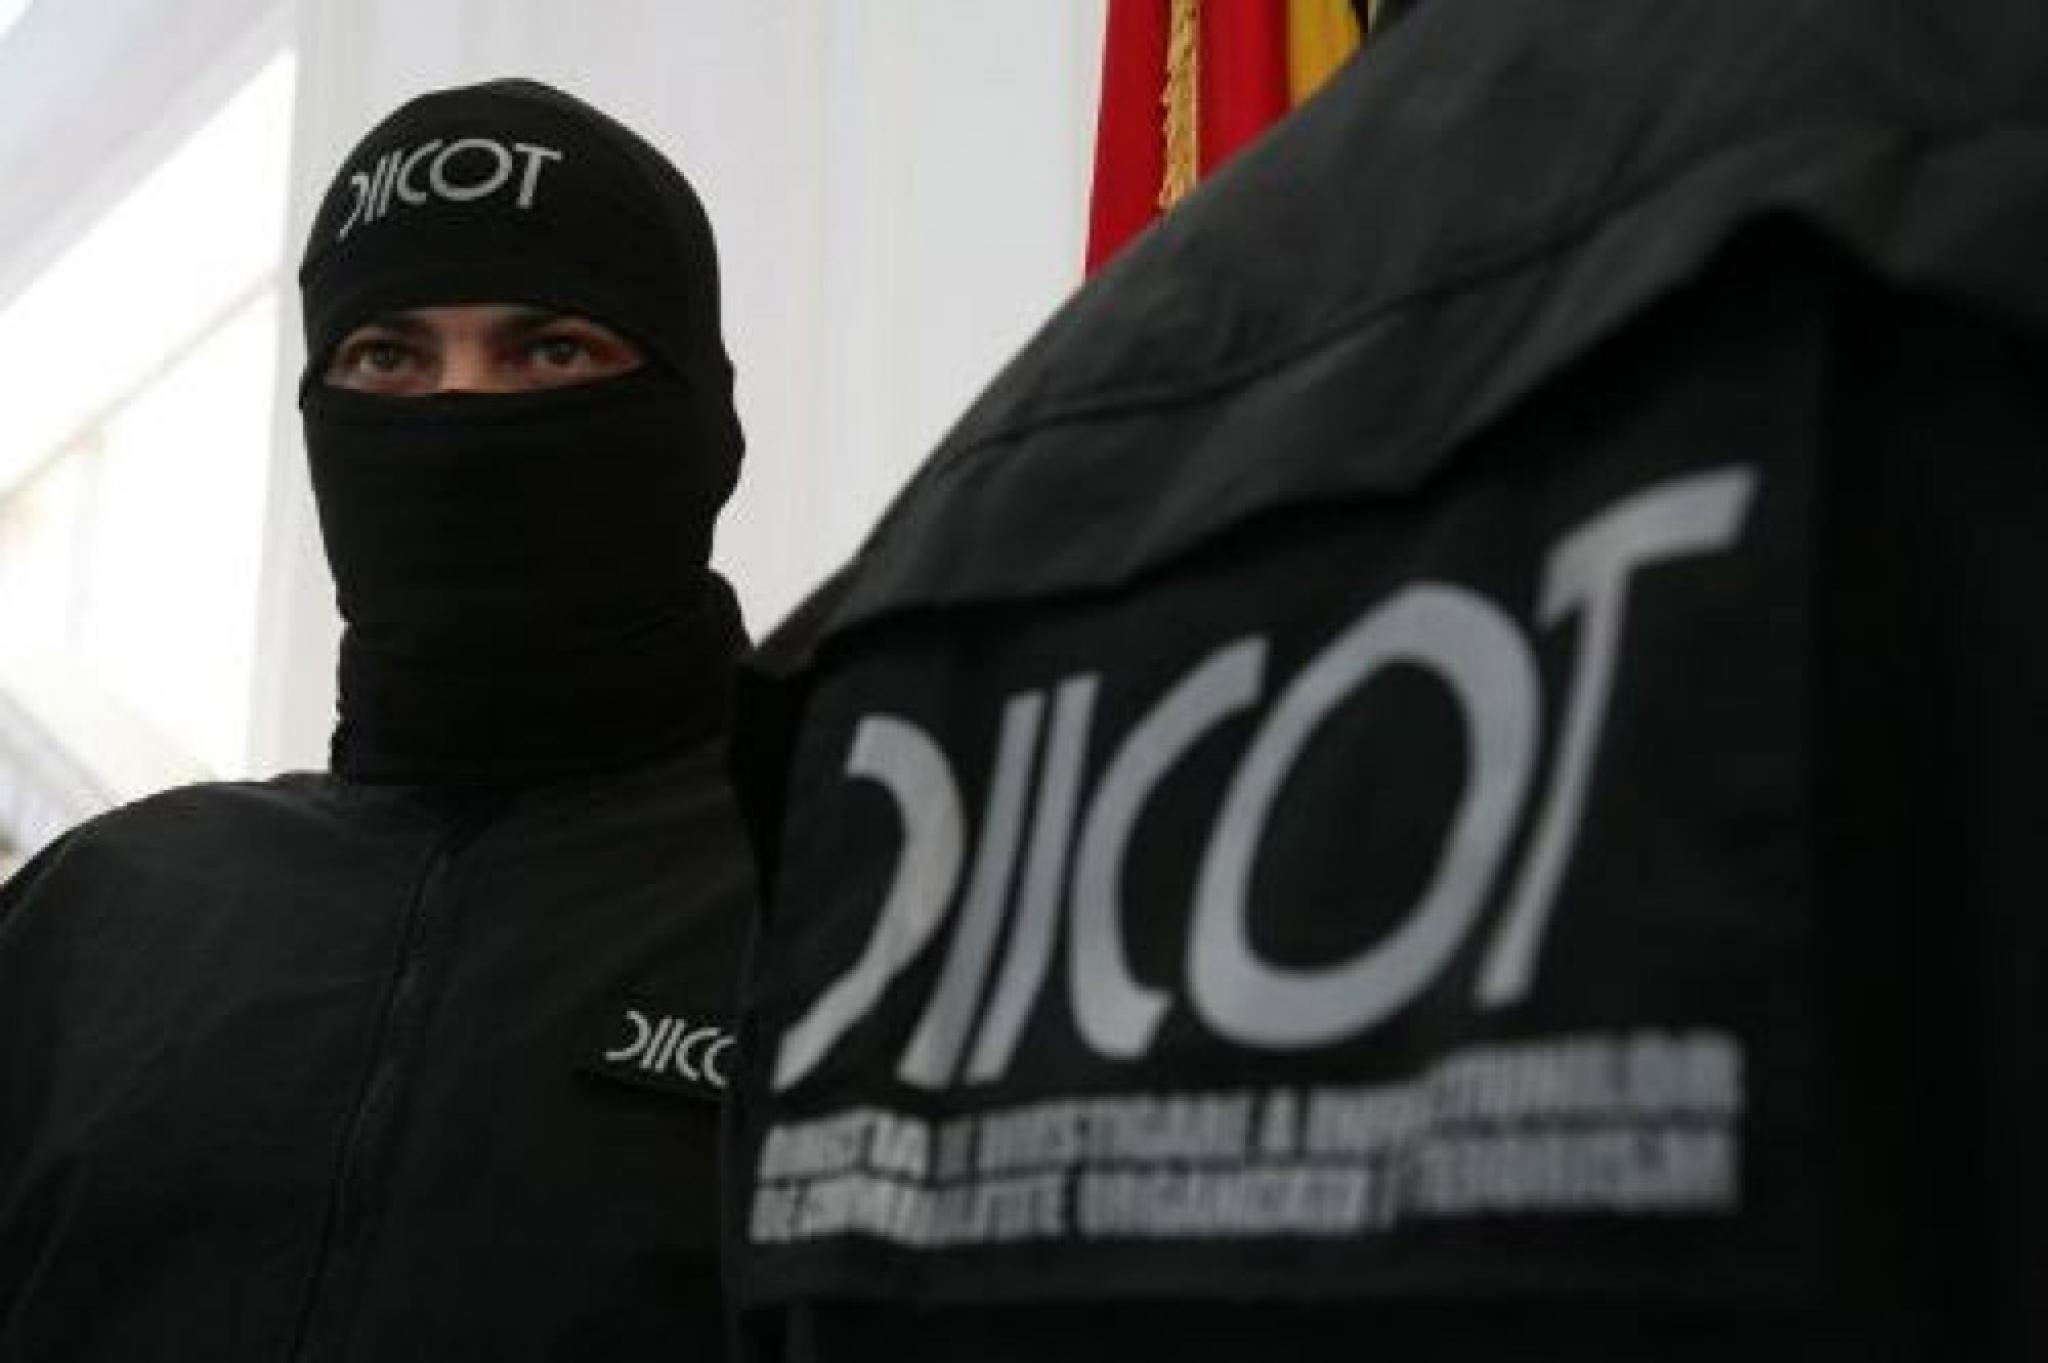 Nume grele de la Vicov arestate in dosarul de contrabanda in care sunt cercetati si 7 politisti de frontiera